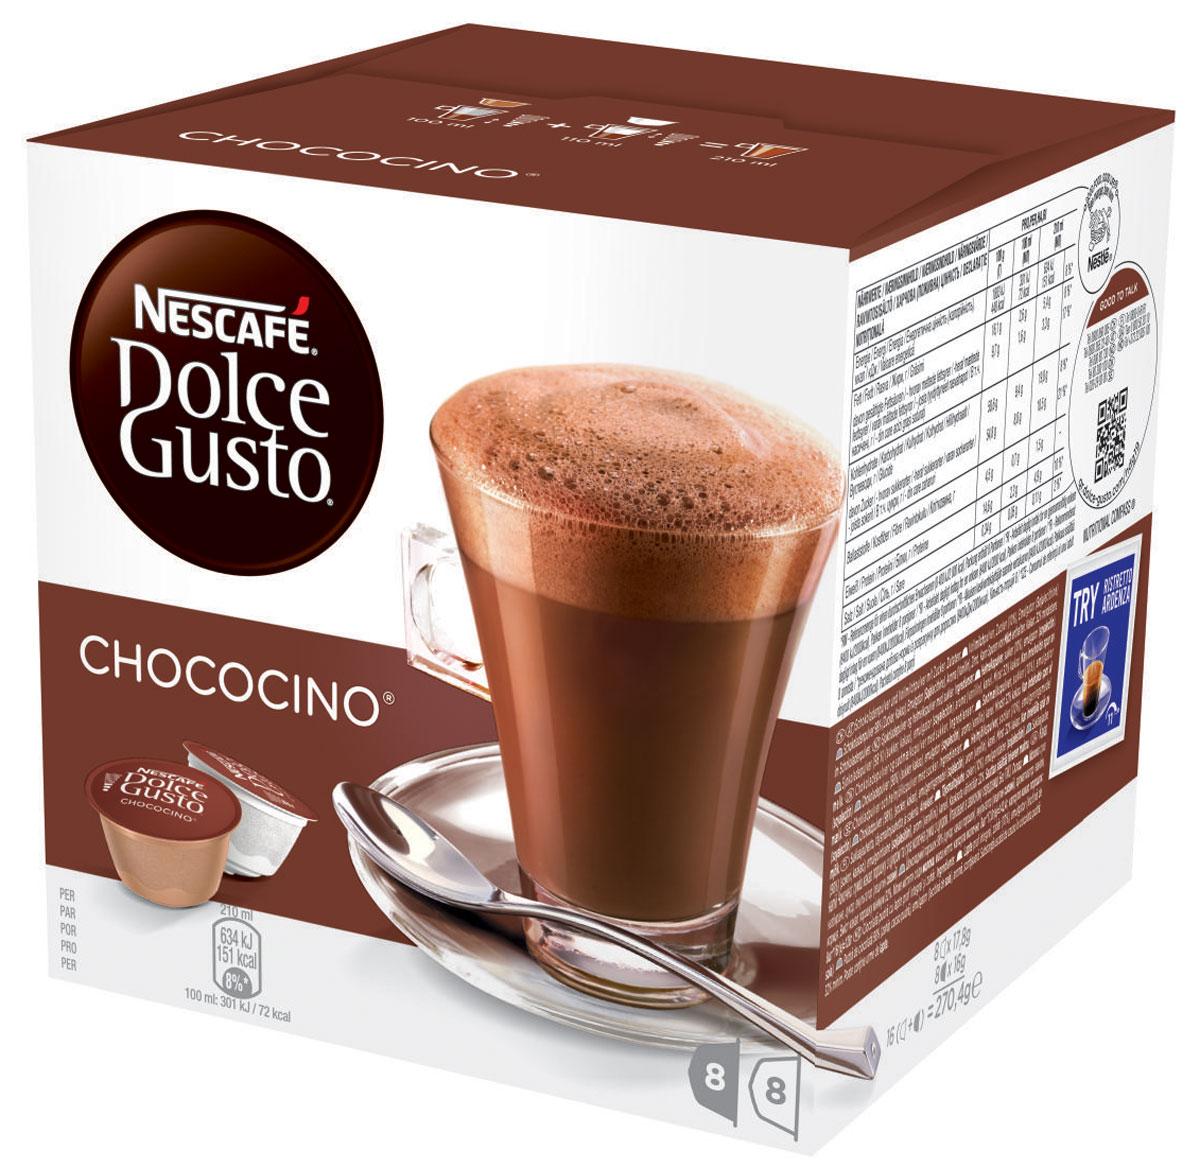 Nescafe Dolce Gusto Chococino горячий шоколад в капсулах, 16 шт